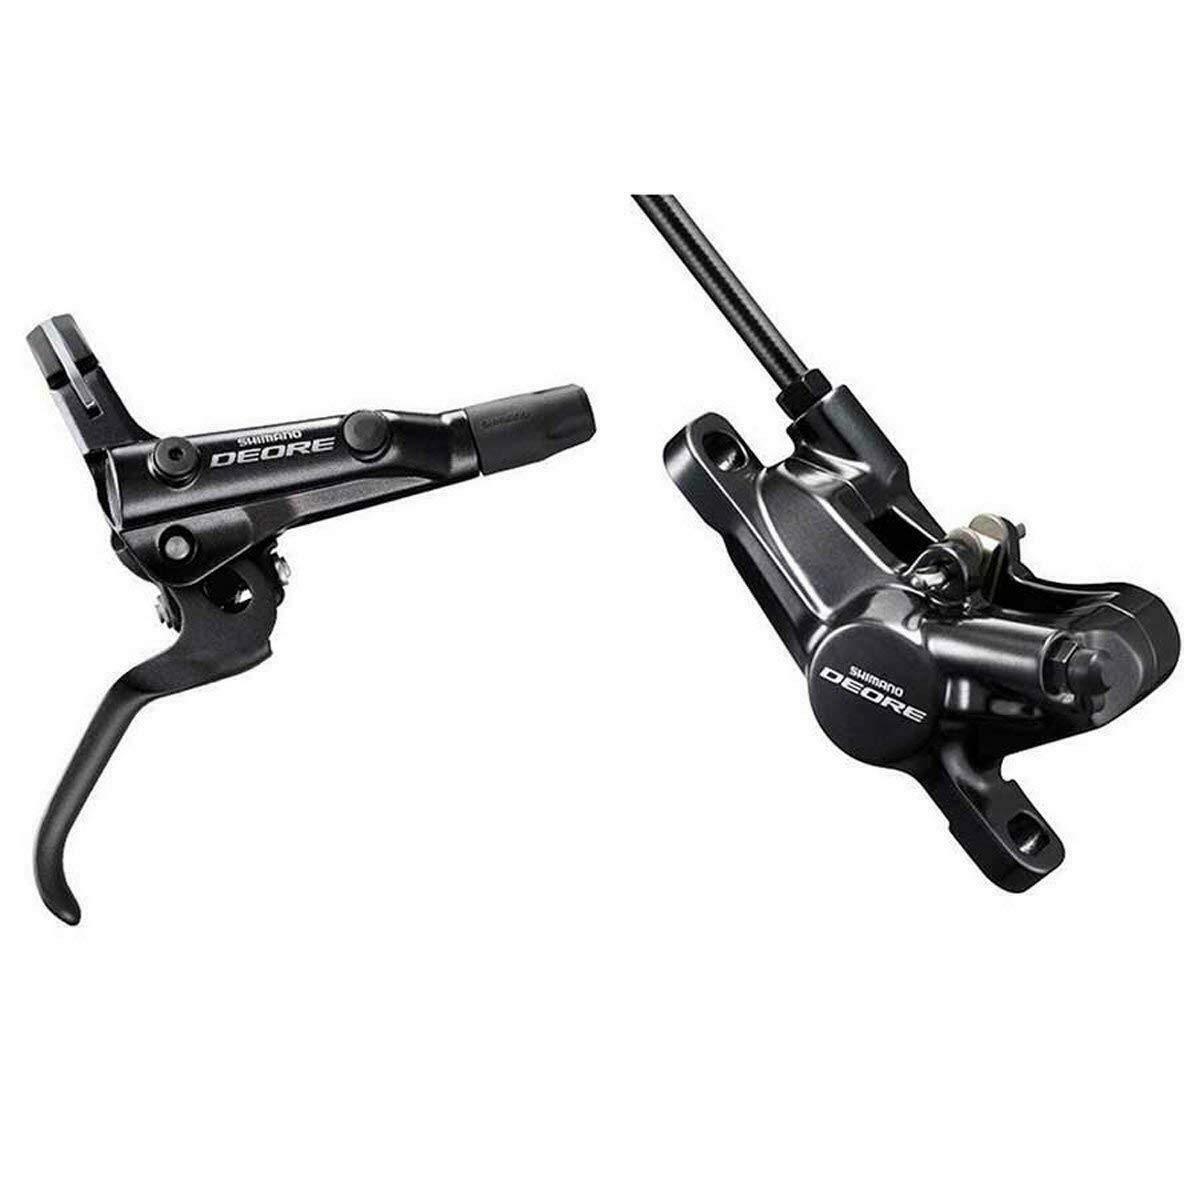 JKSPORTS Shimano Hydraulic Disc Brake Set M6000 M7000 XT M8000 Brakes Set,MTB Hydraulic disc Brakes Set (M6000 a Pair Hydraulic Disc Brake Set)